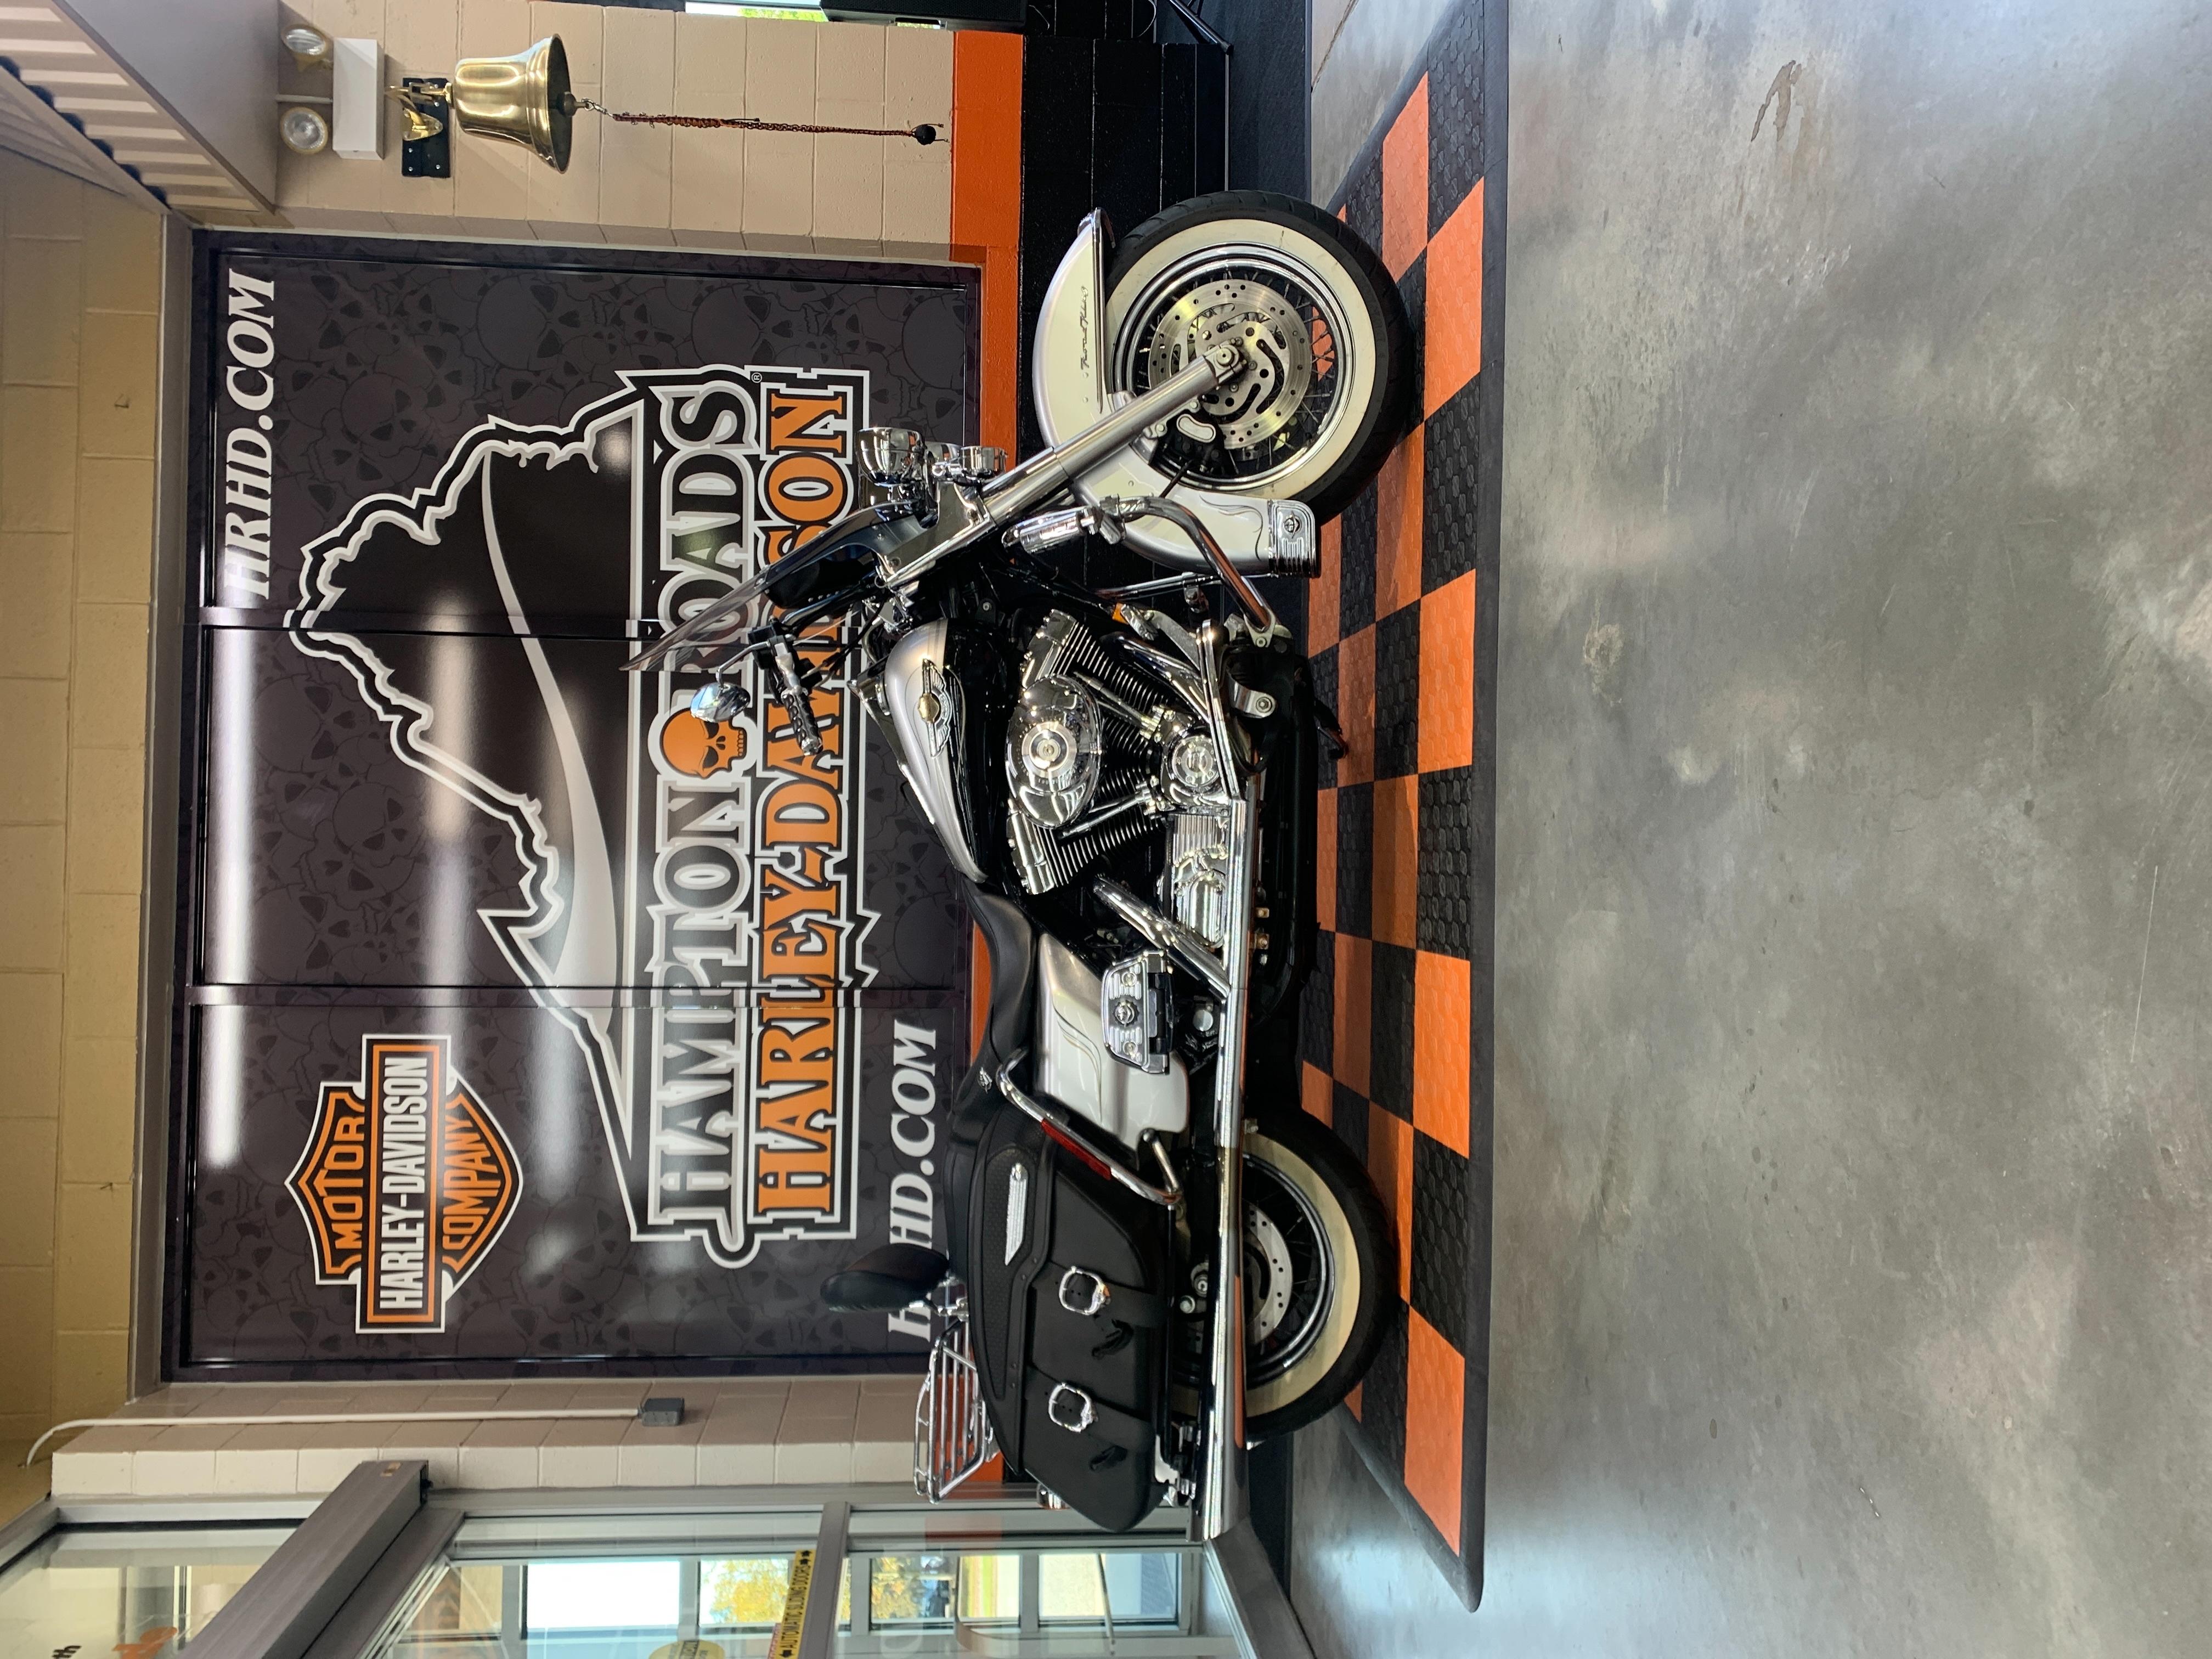 2003 HARLEY FLHR at Hampton Roads Harley-Davidson